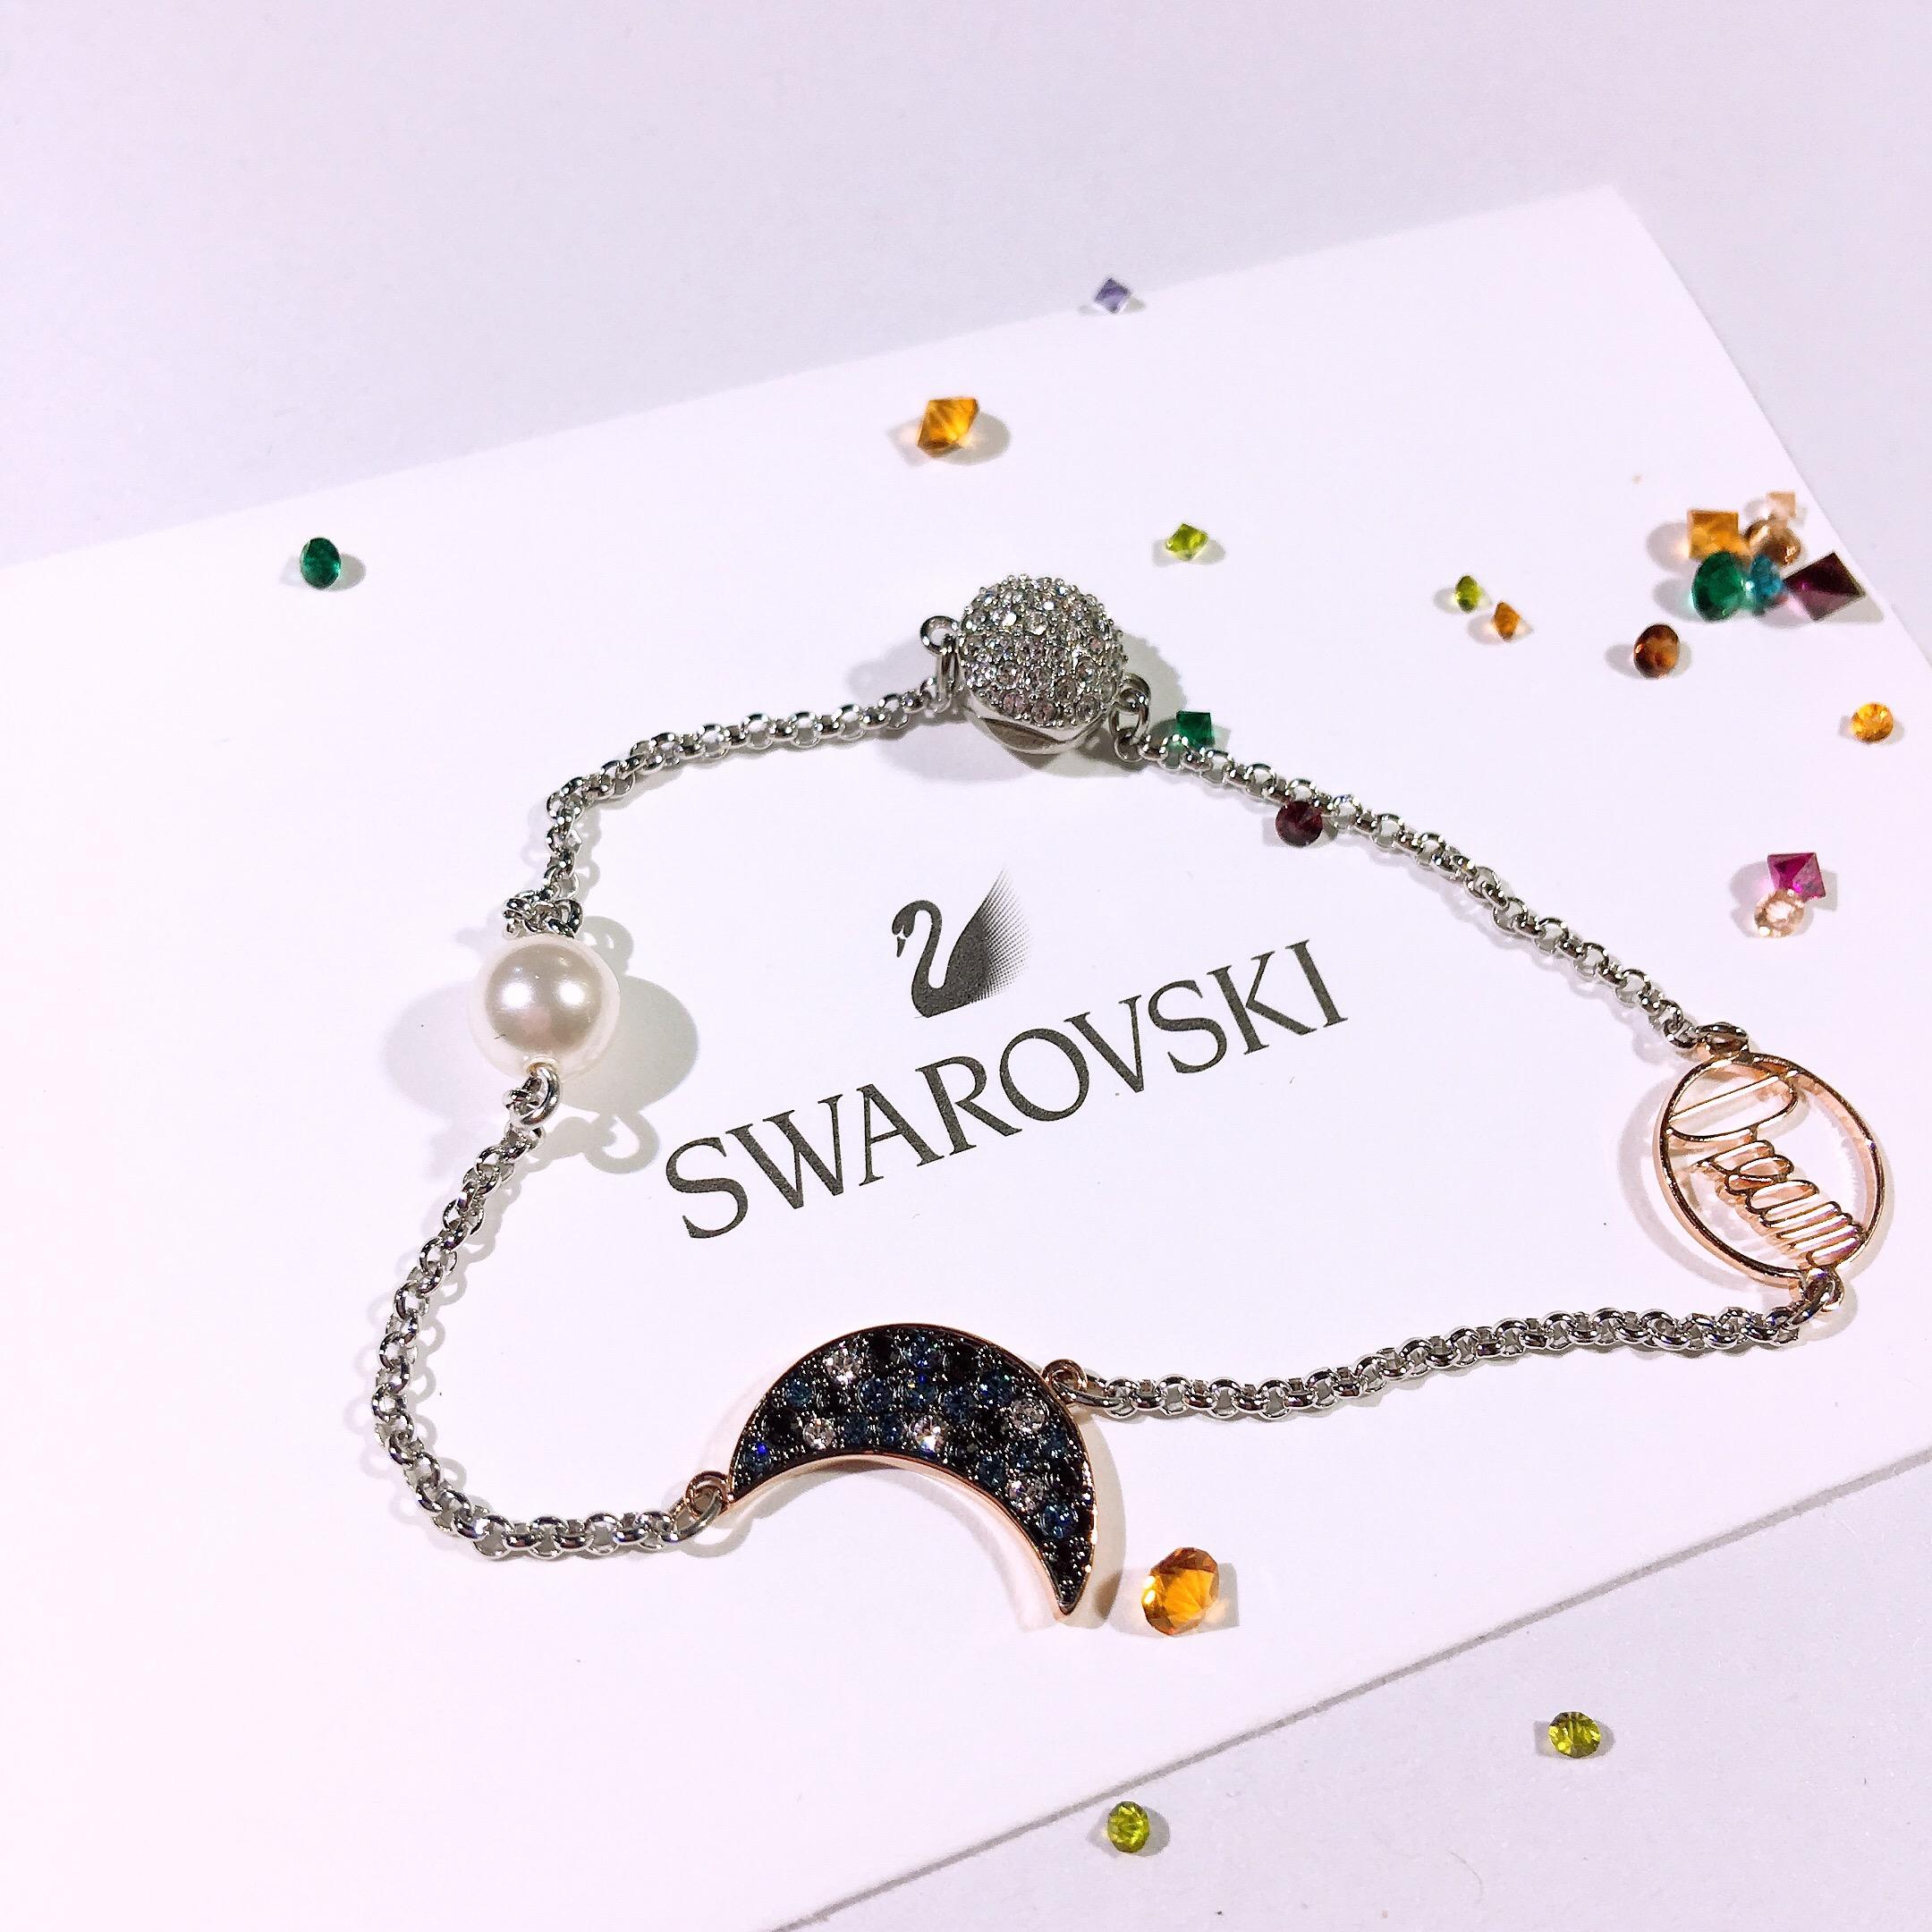 Swarovski 施华洛世奇 蓝色珍珠星月手链 5490934 ¥367